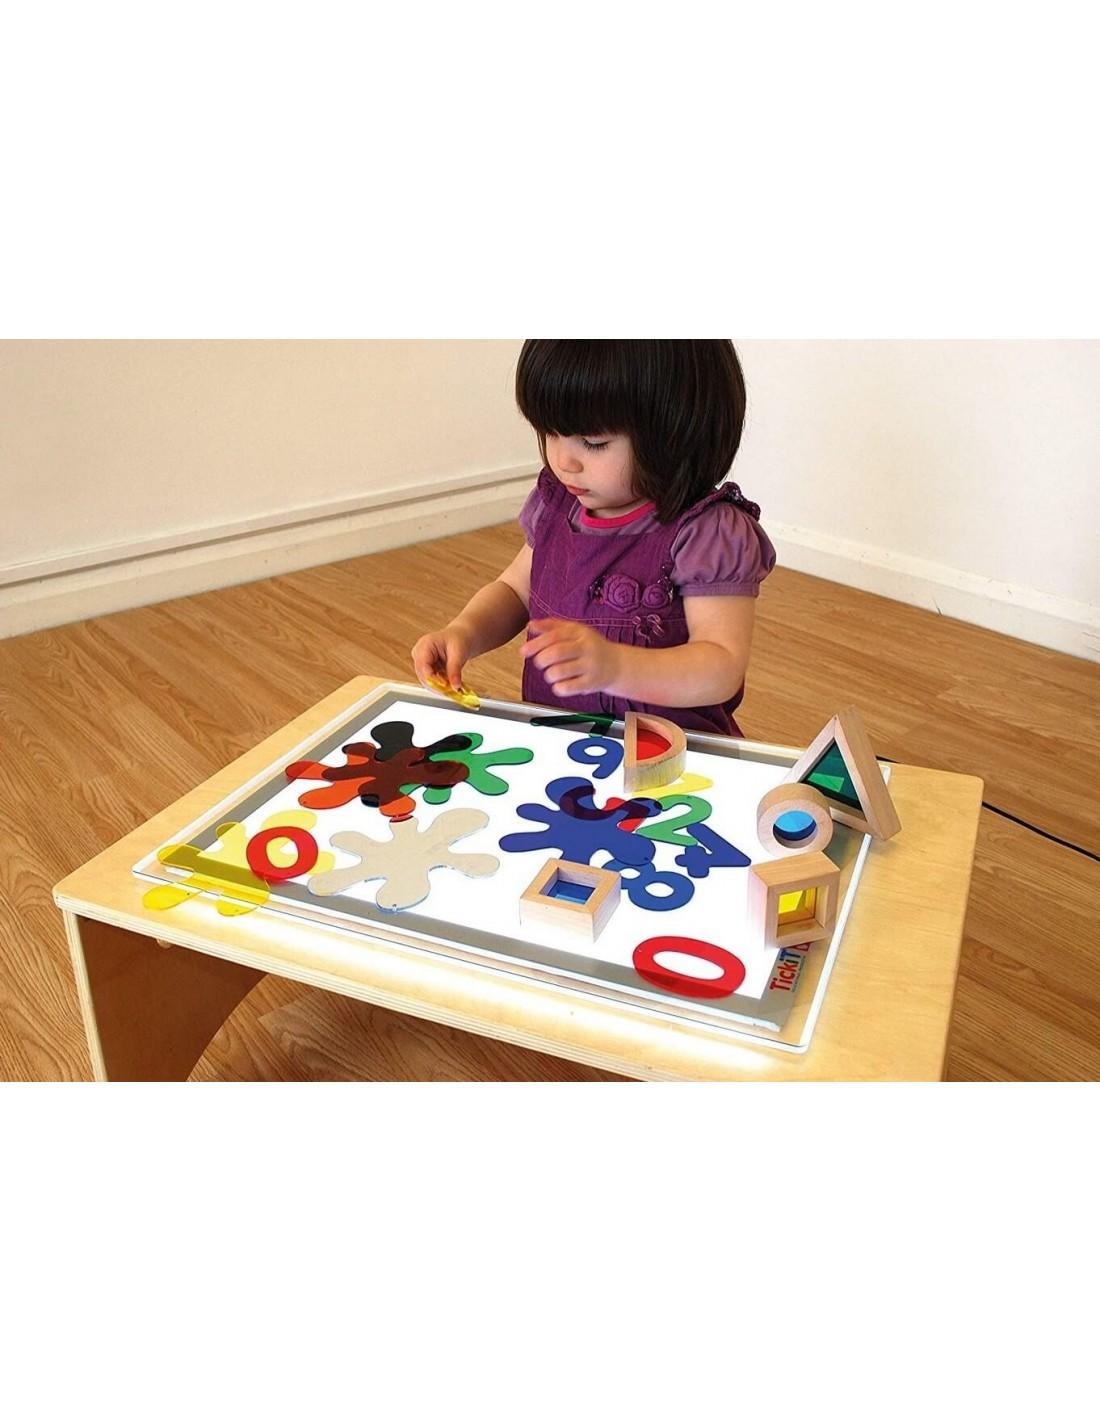 plaque lumineuse led a3 montessori s 39 amuser autrement. Black Bedroom Furniture Sets. Home Design Ideas